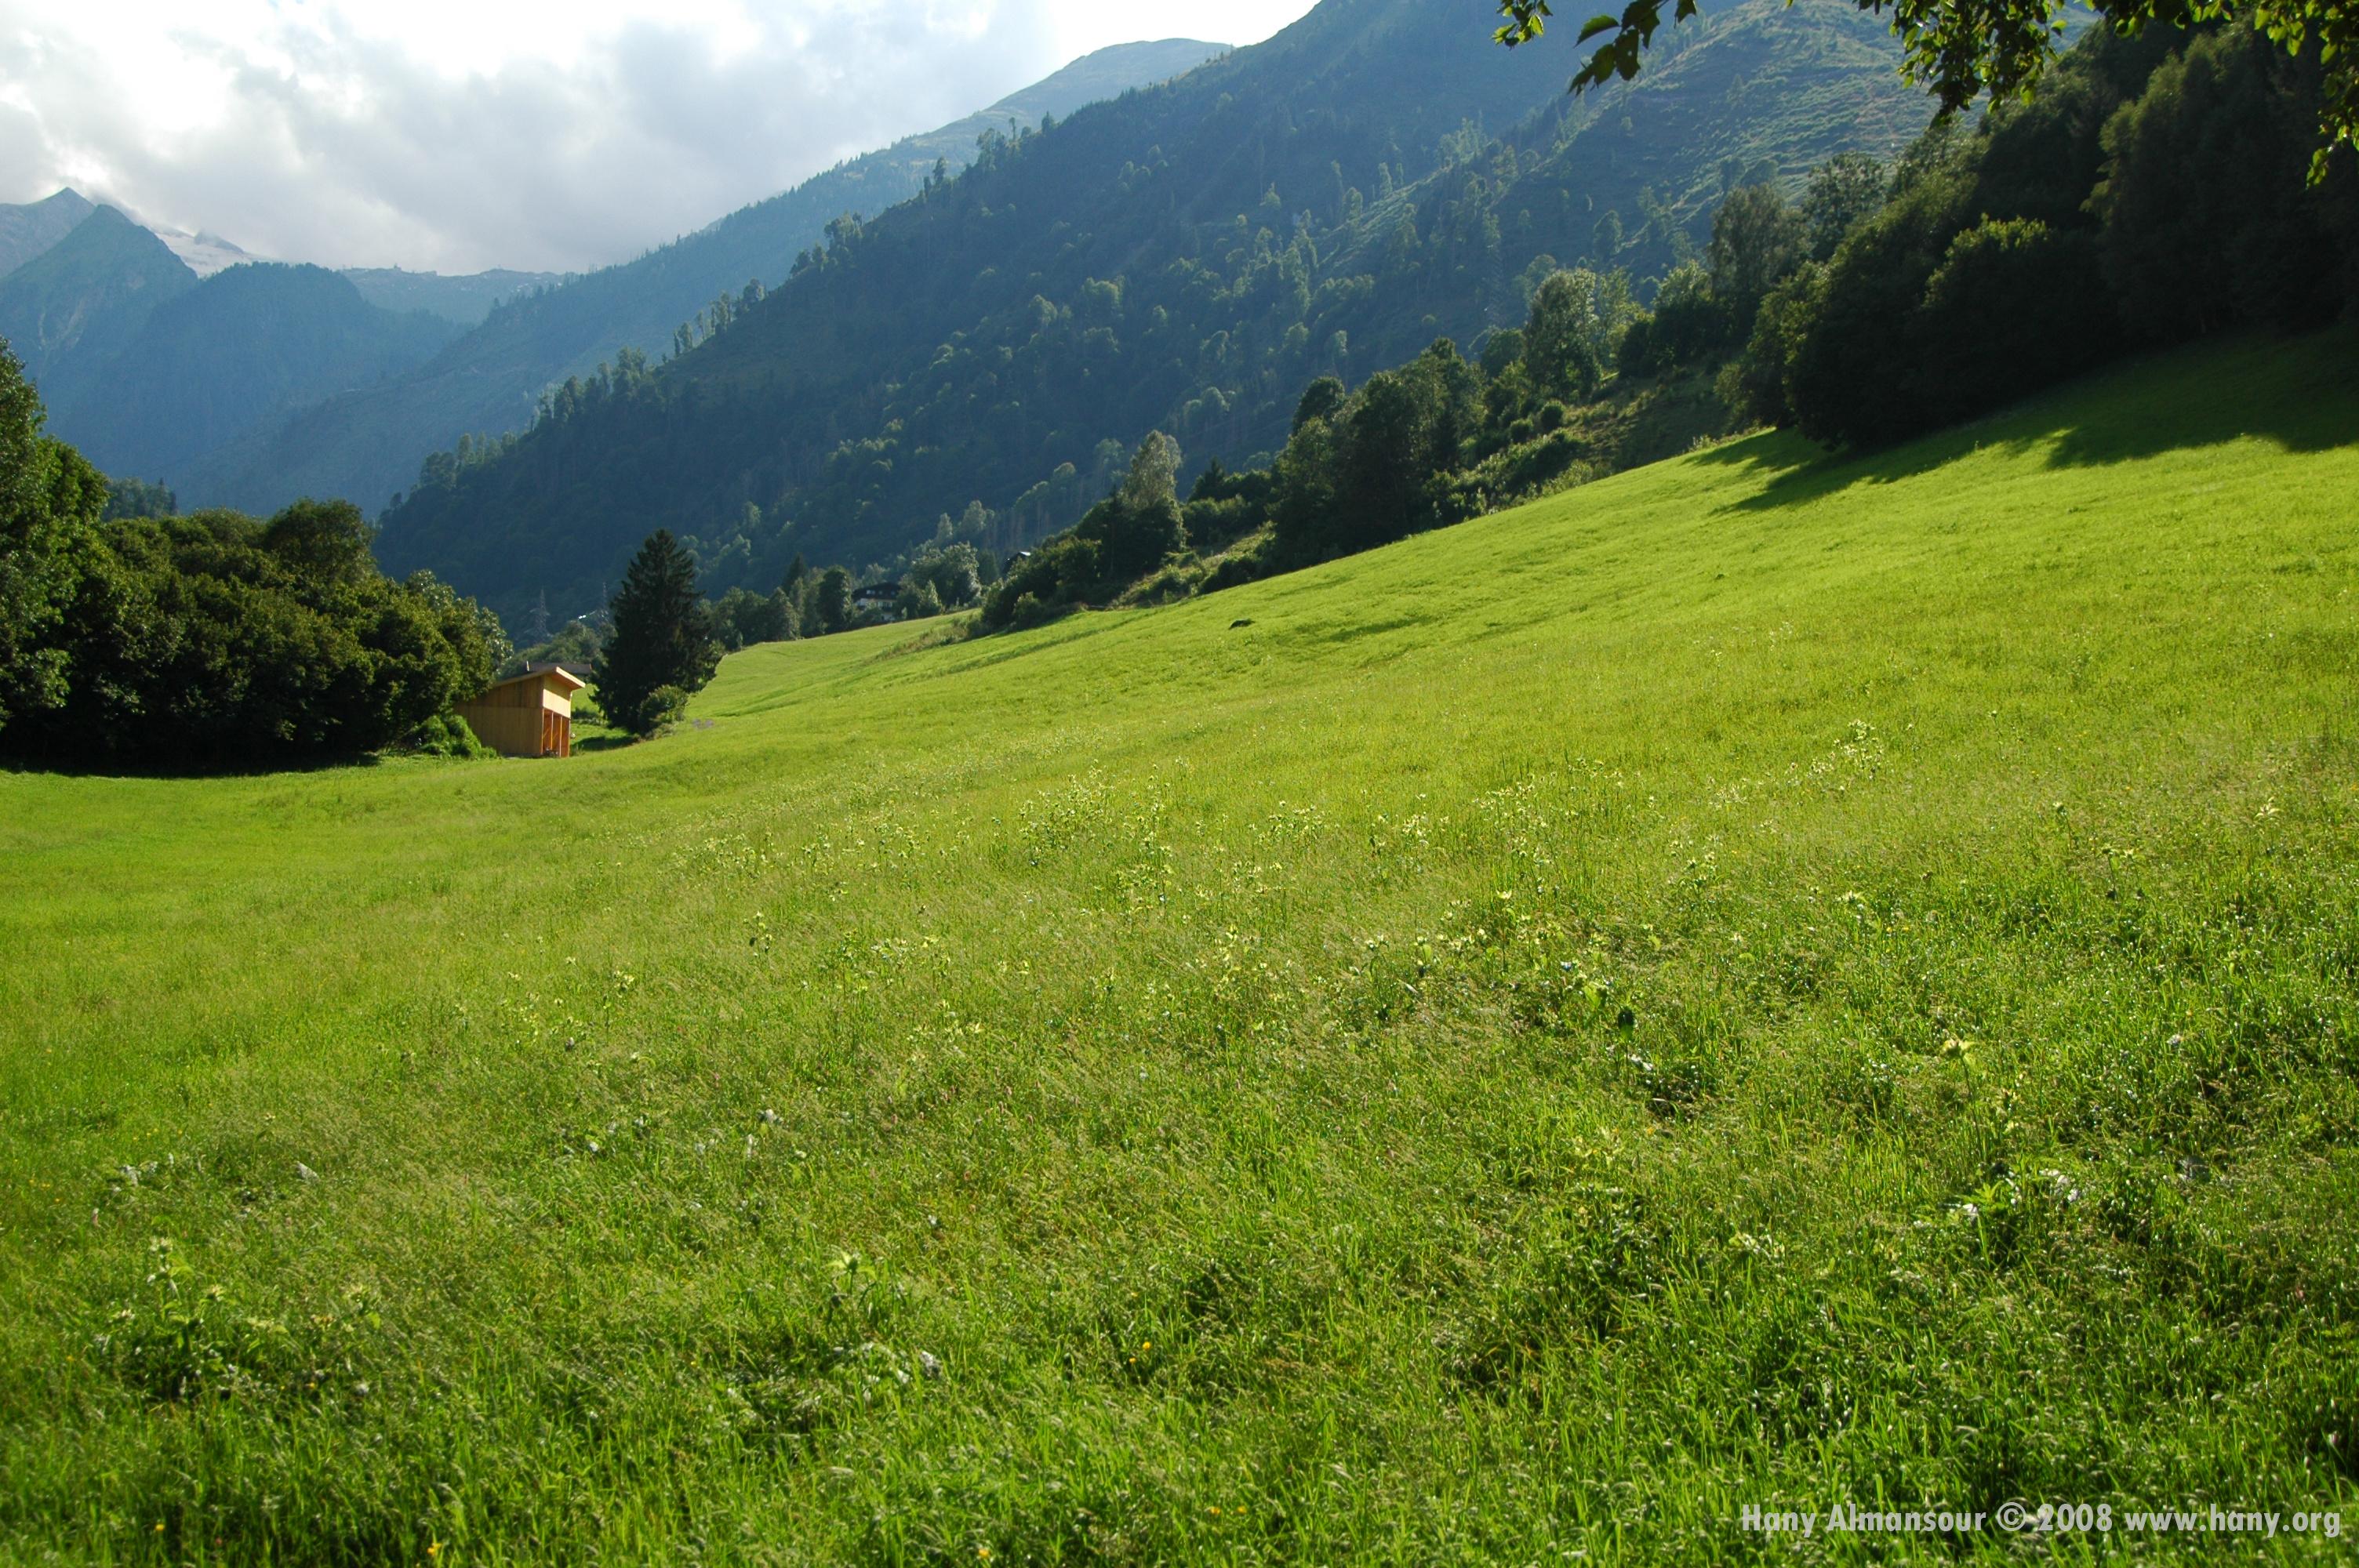 Hany_Landscape.jpg